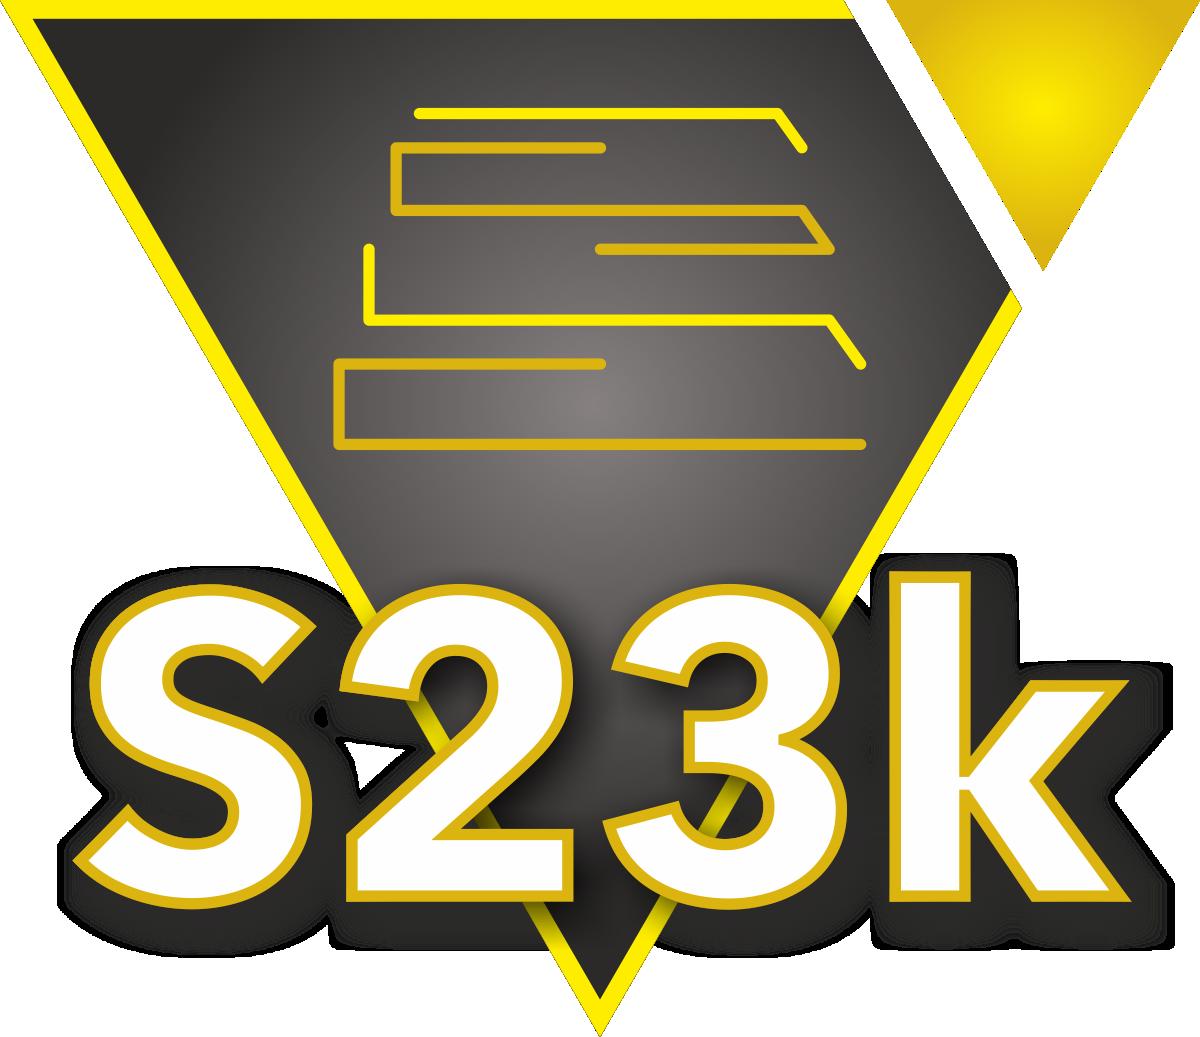 S23k Business Resilience logo